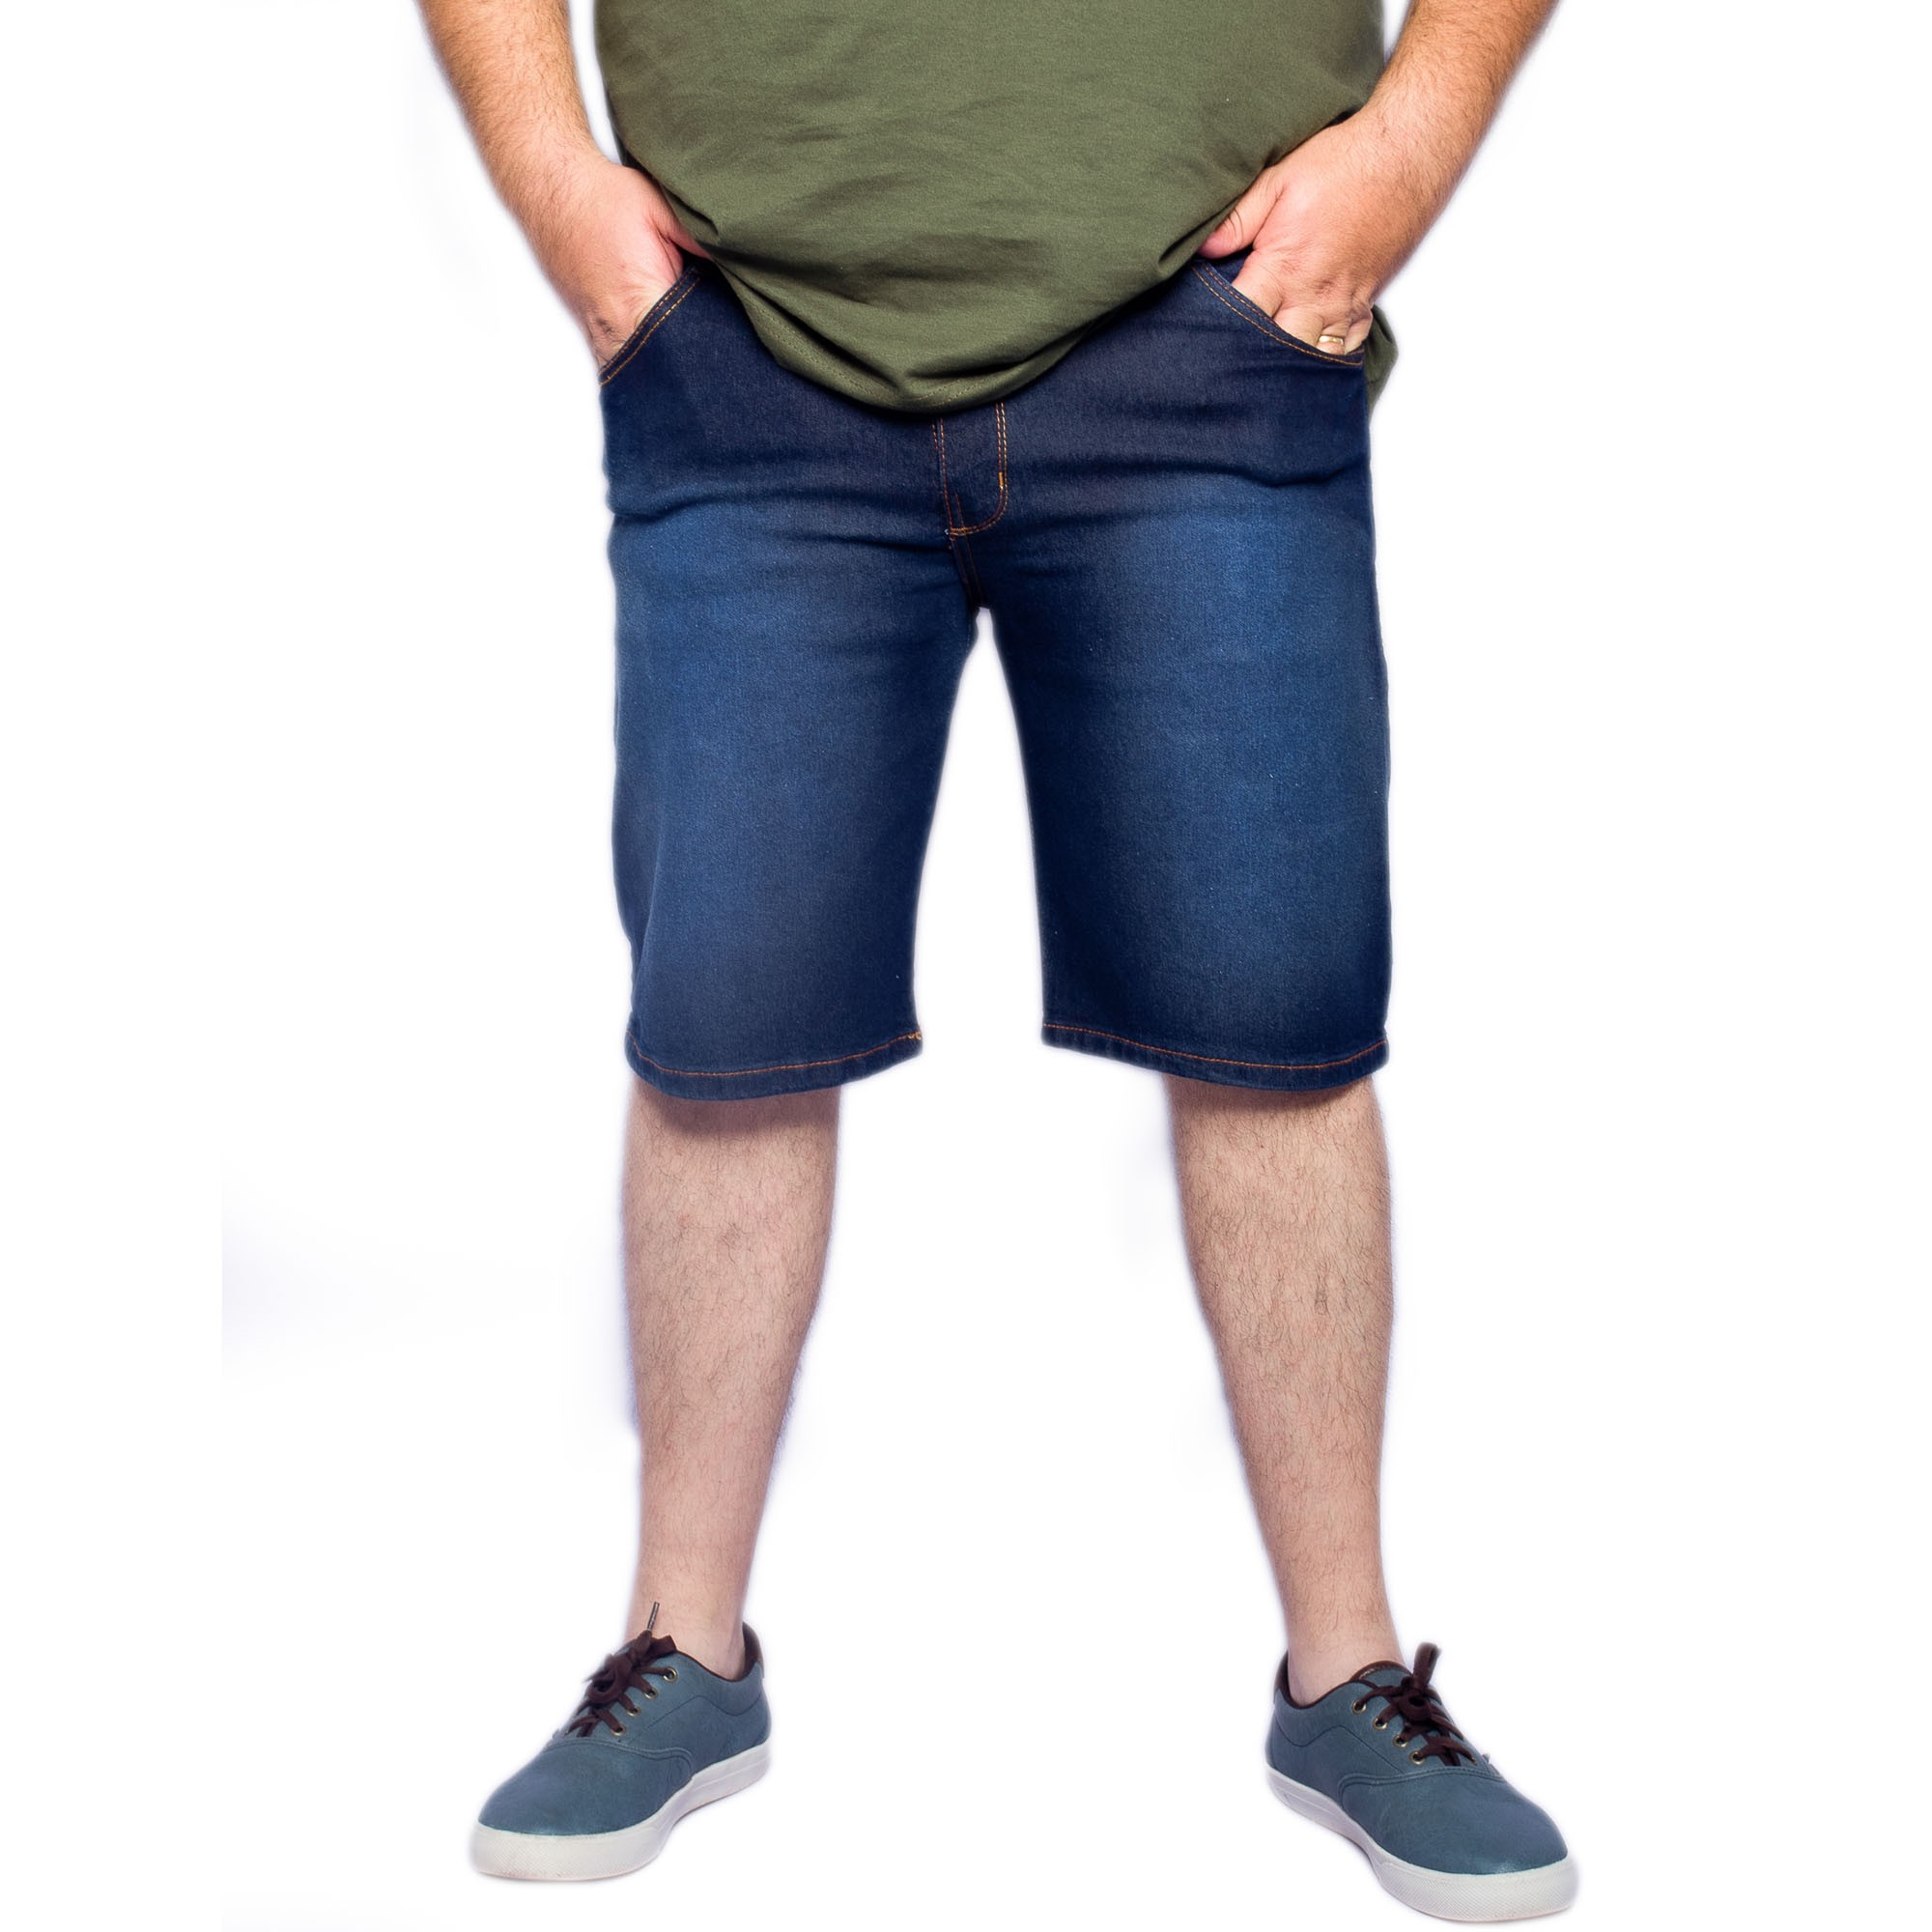 Bermuda Masculina Jeans Plus Size - Aizone